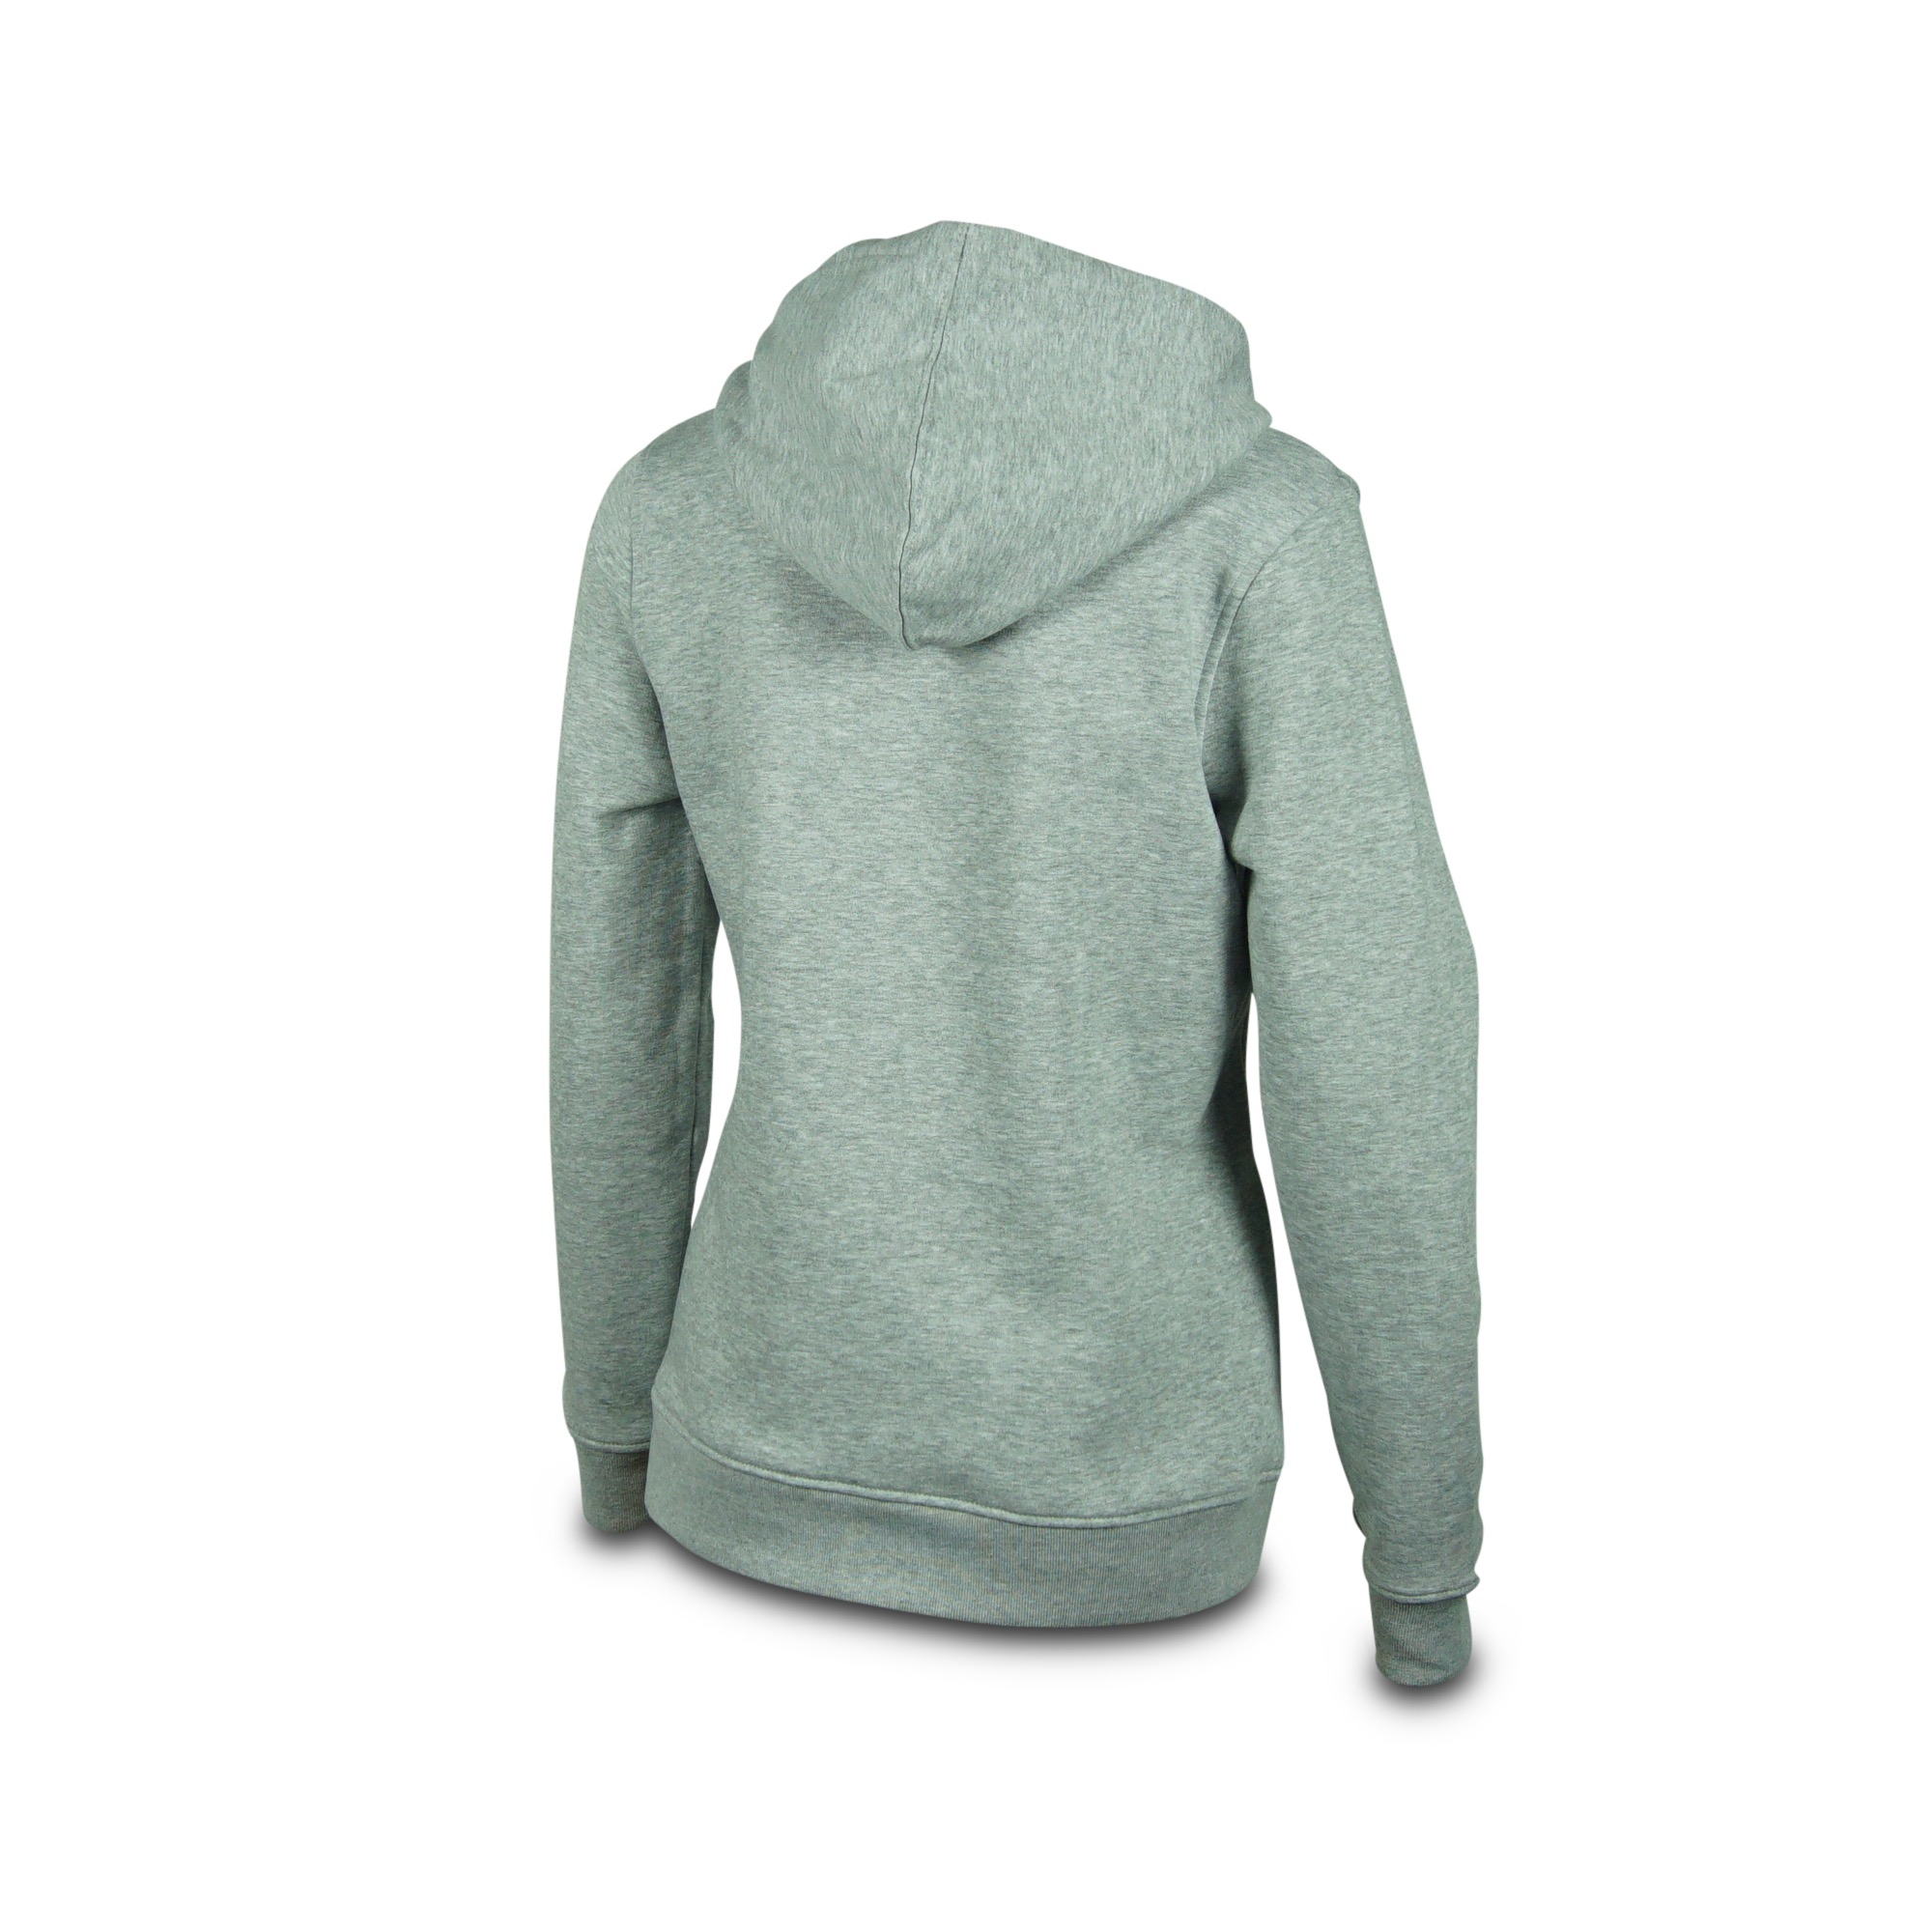 hoodie_damen_grau_hinten